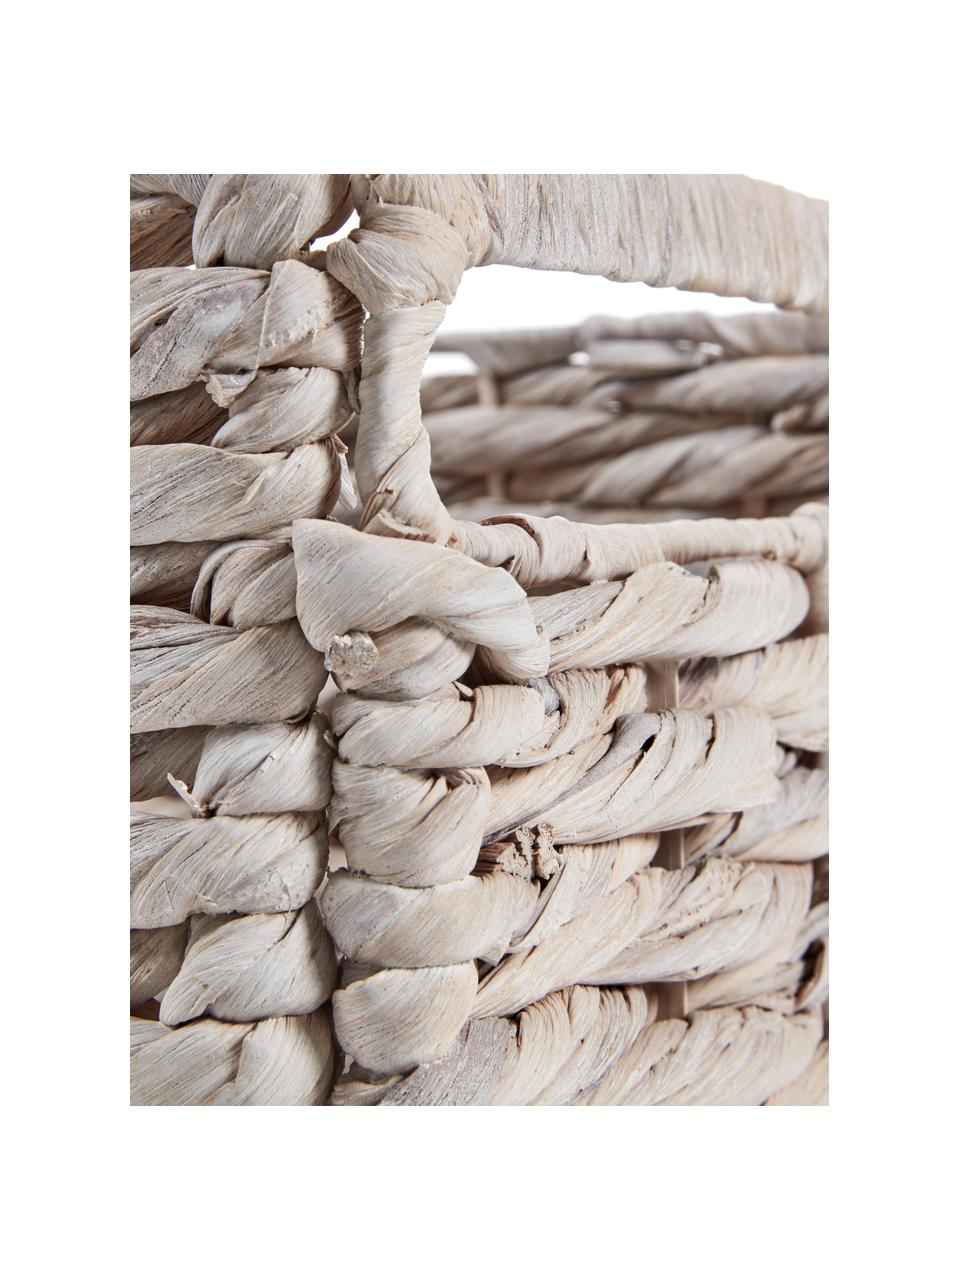 Opbergmand Words in wit, Mand: waterhyacint, Frame: metaal, Wit, 35 x 27 cm